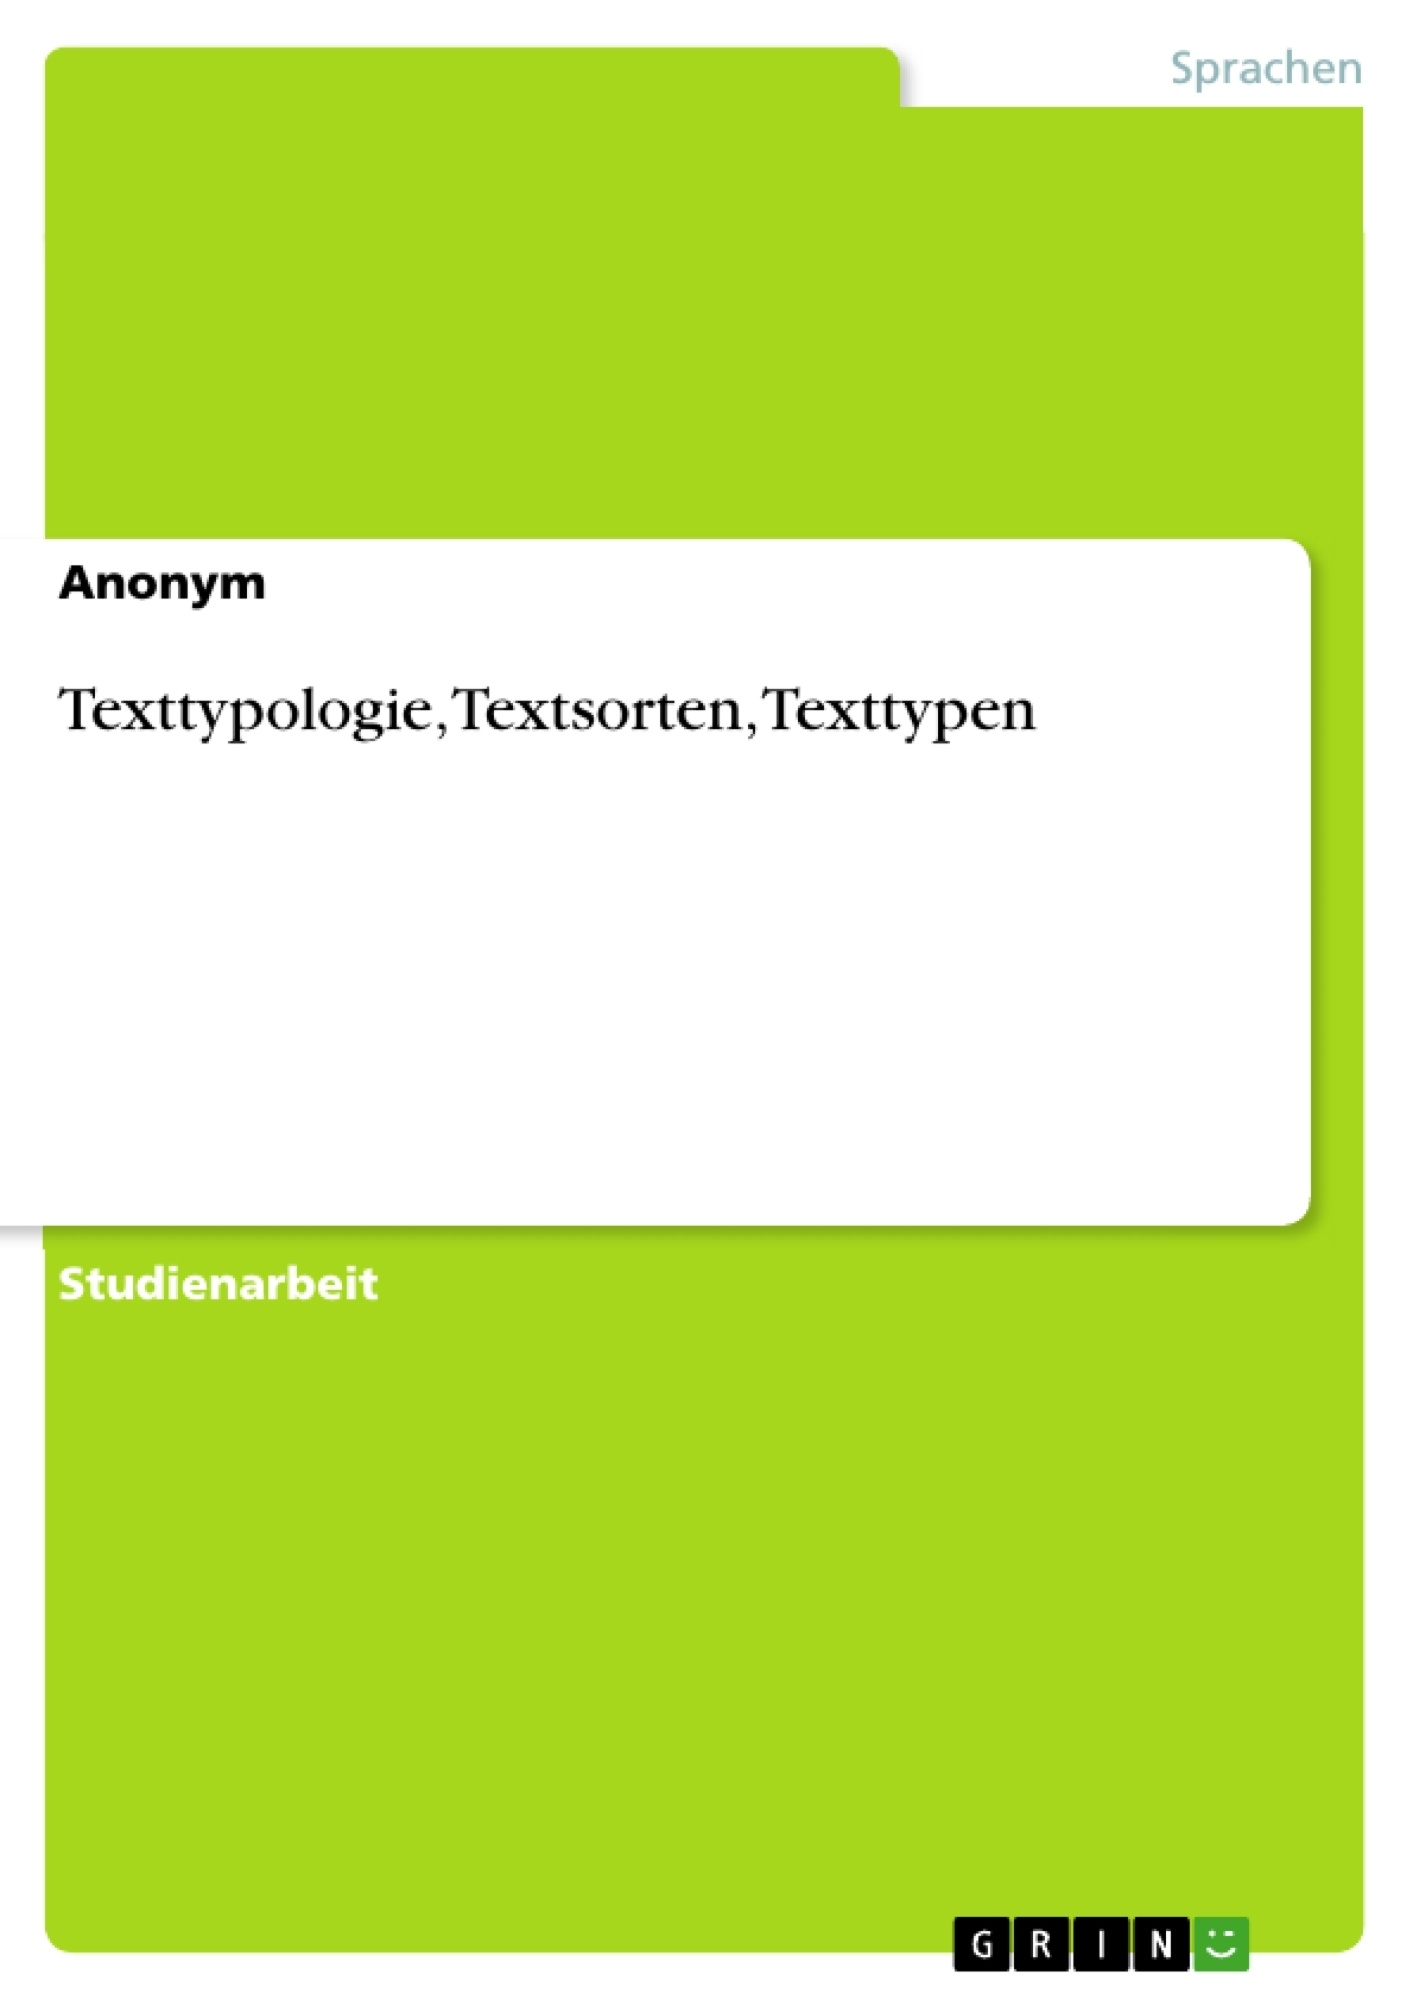 Titel: Texttypologie, Textsorten, Texttypen